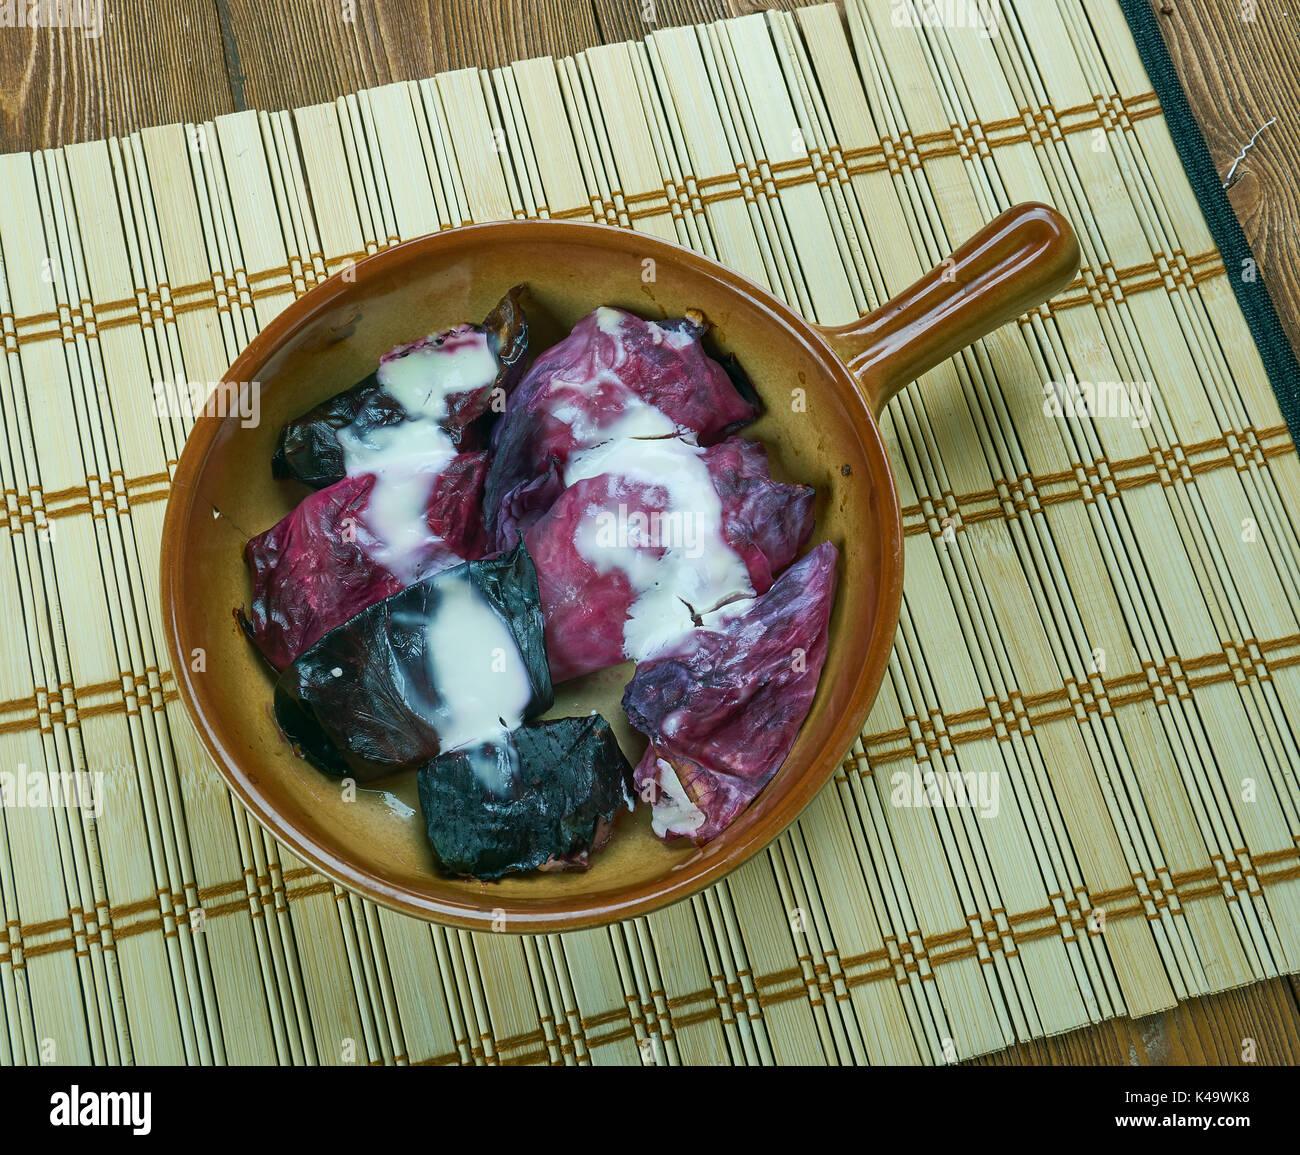 German Red Cabbage Rolls - Rotkohl - Stock Image